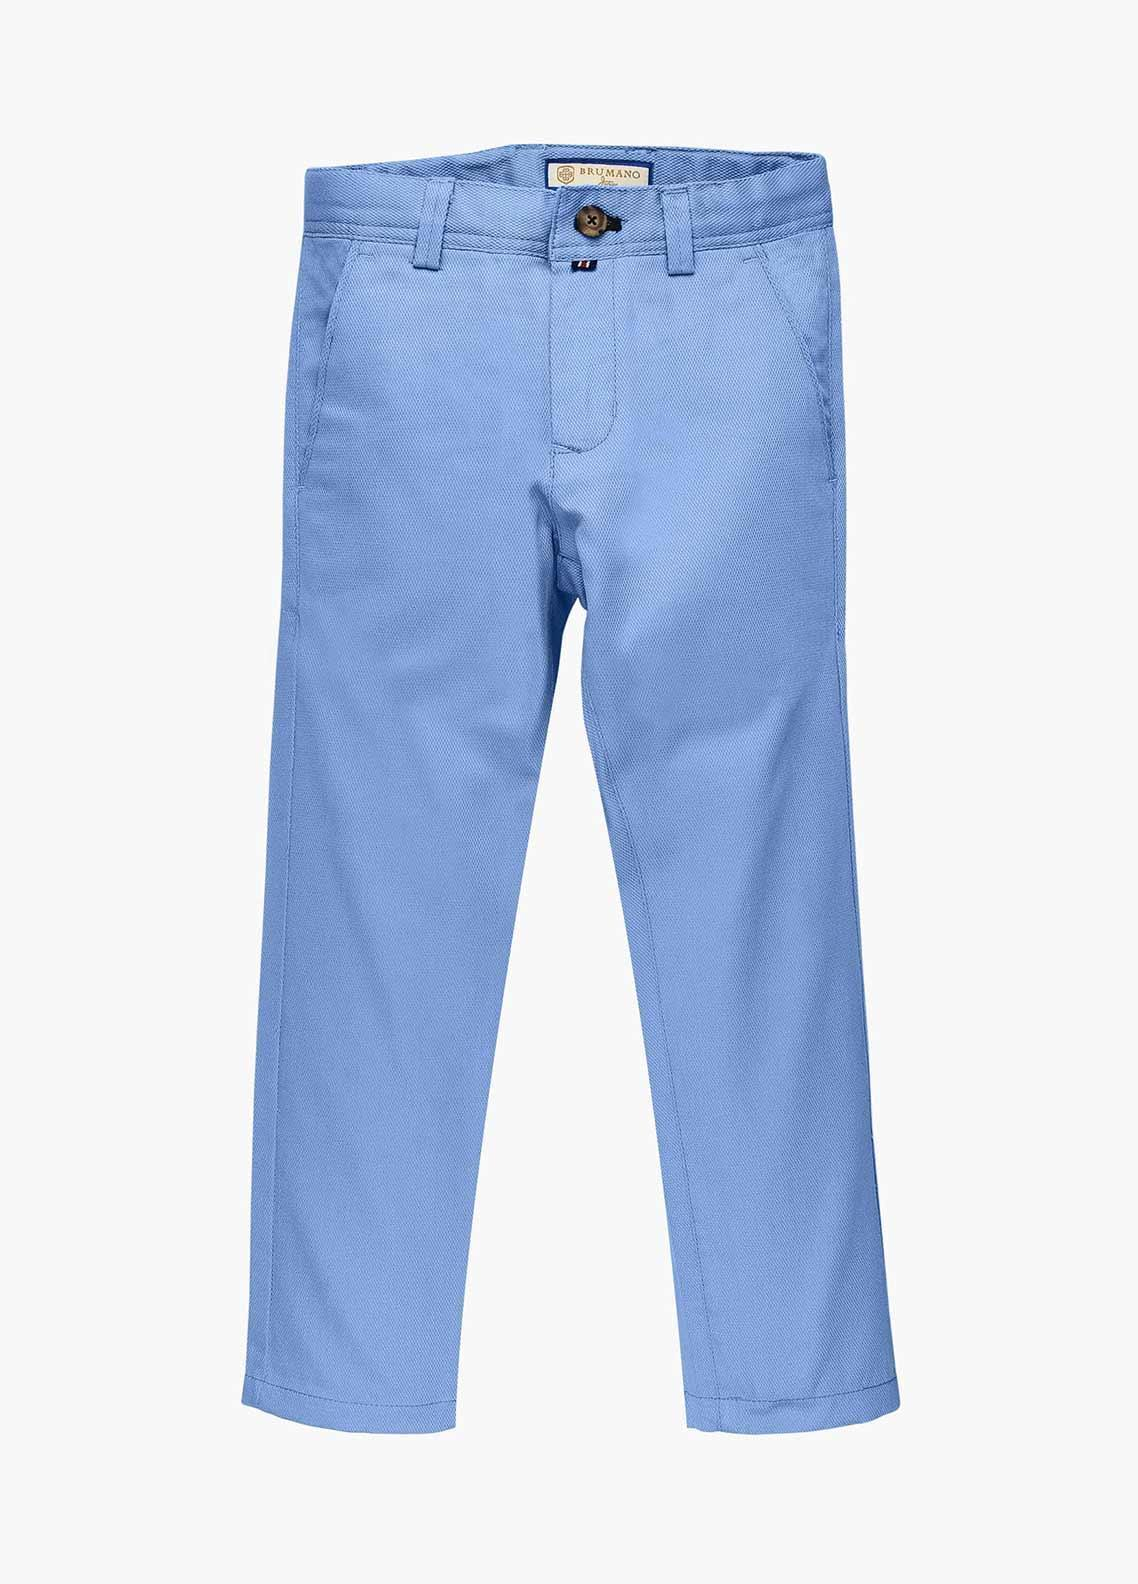 Brumano Cotton Casual Boys Trousers - Blue BM20JP Light Blue Structured Casual Trouser - Junior